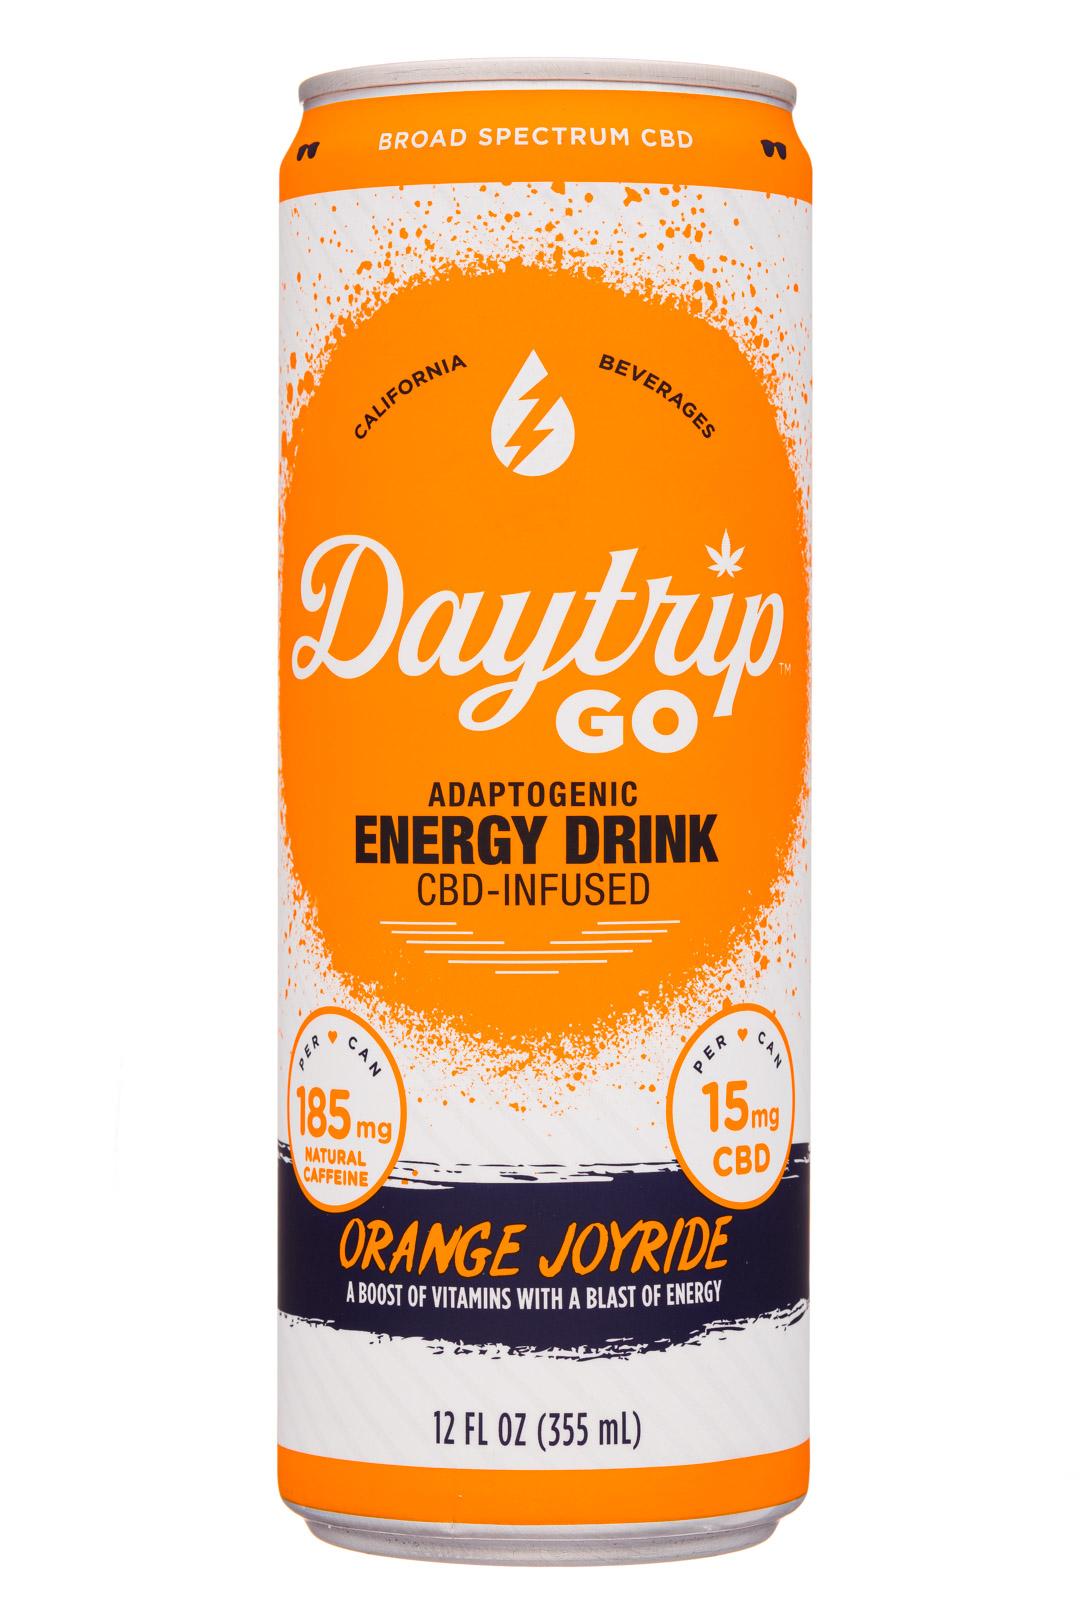 Orange Joyride - Hemp-Infused Functional Energy Drink